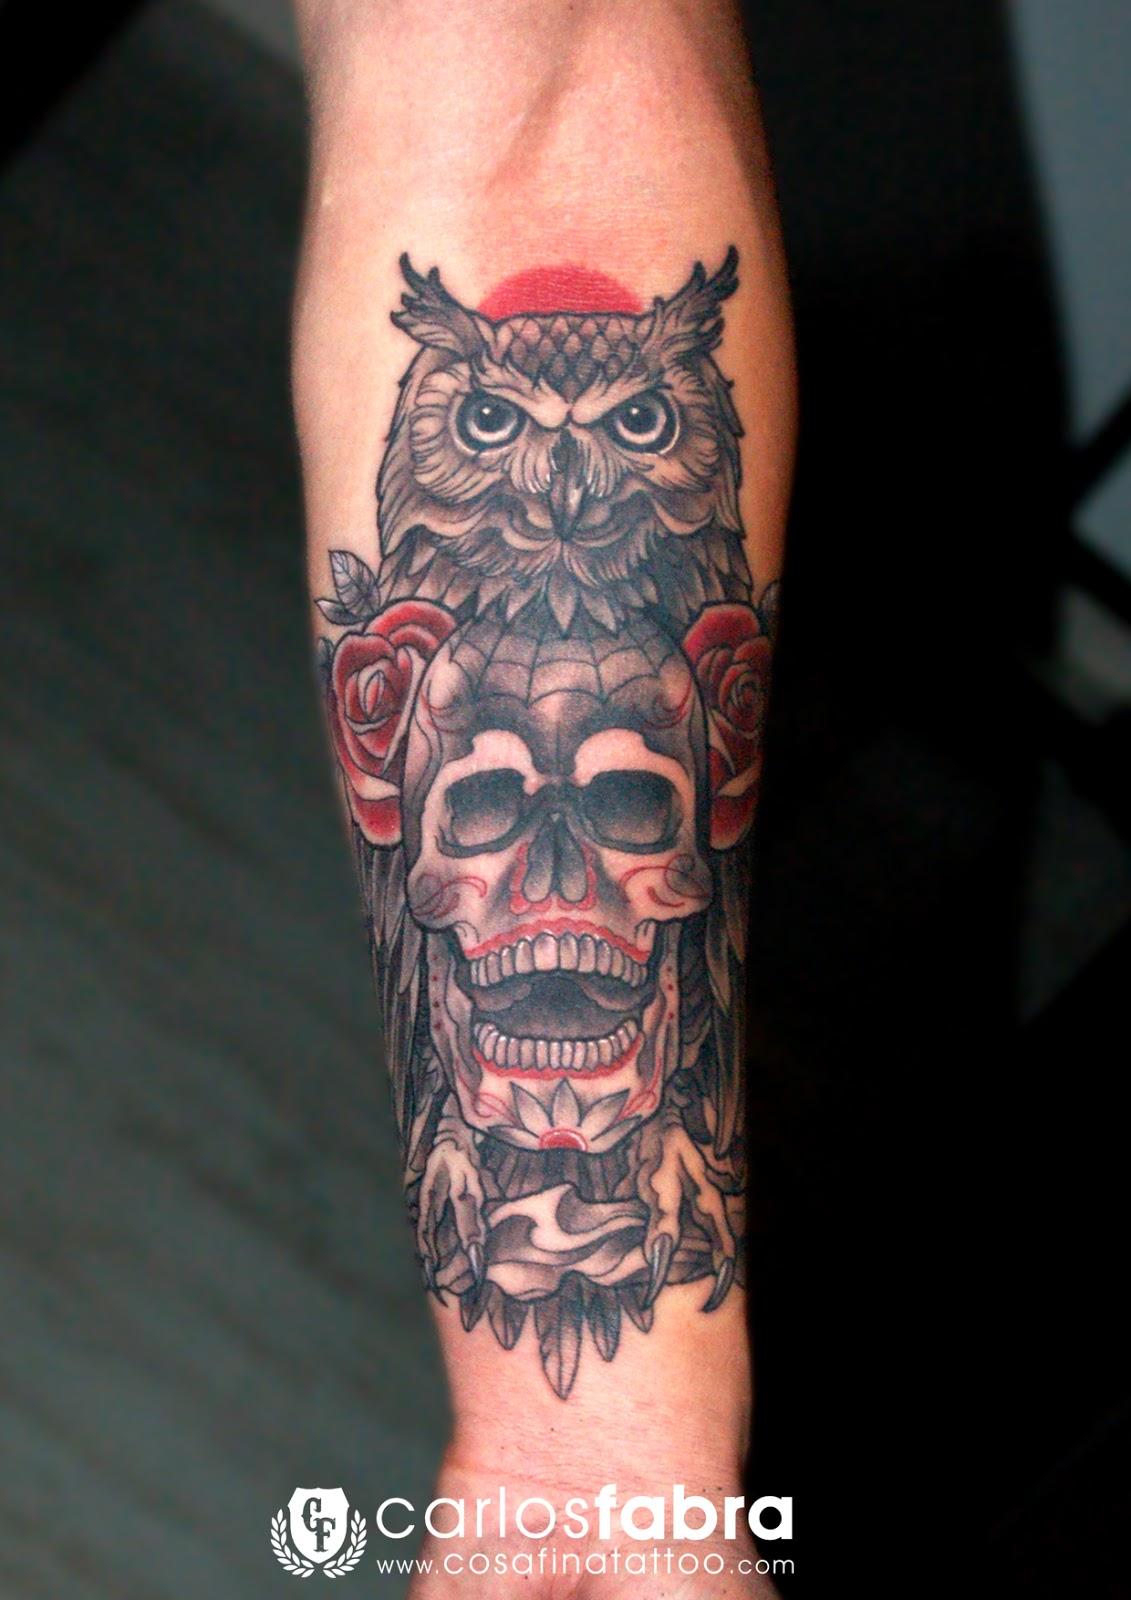 Imagenes De Tatuajes De Rosas - Tatuajes y diseños de tatuajes de rosas ZonaTattoos